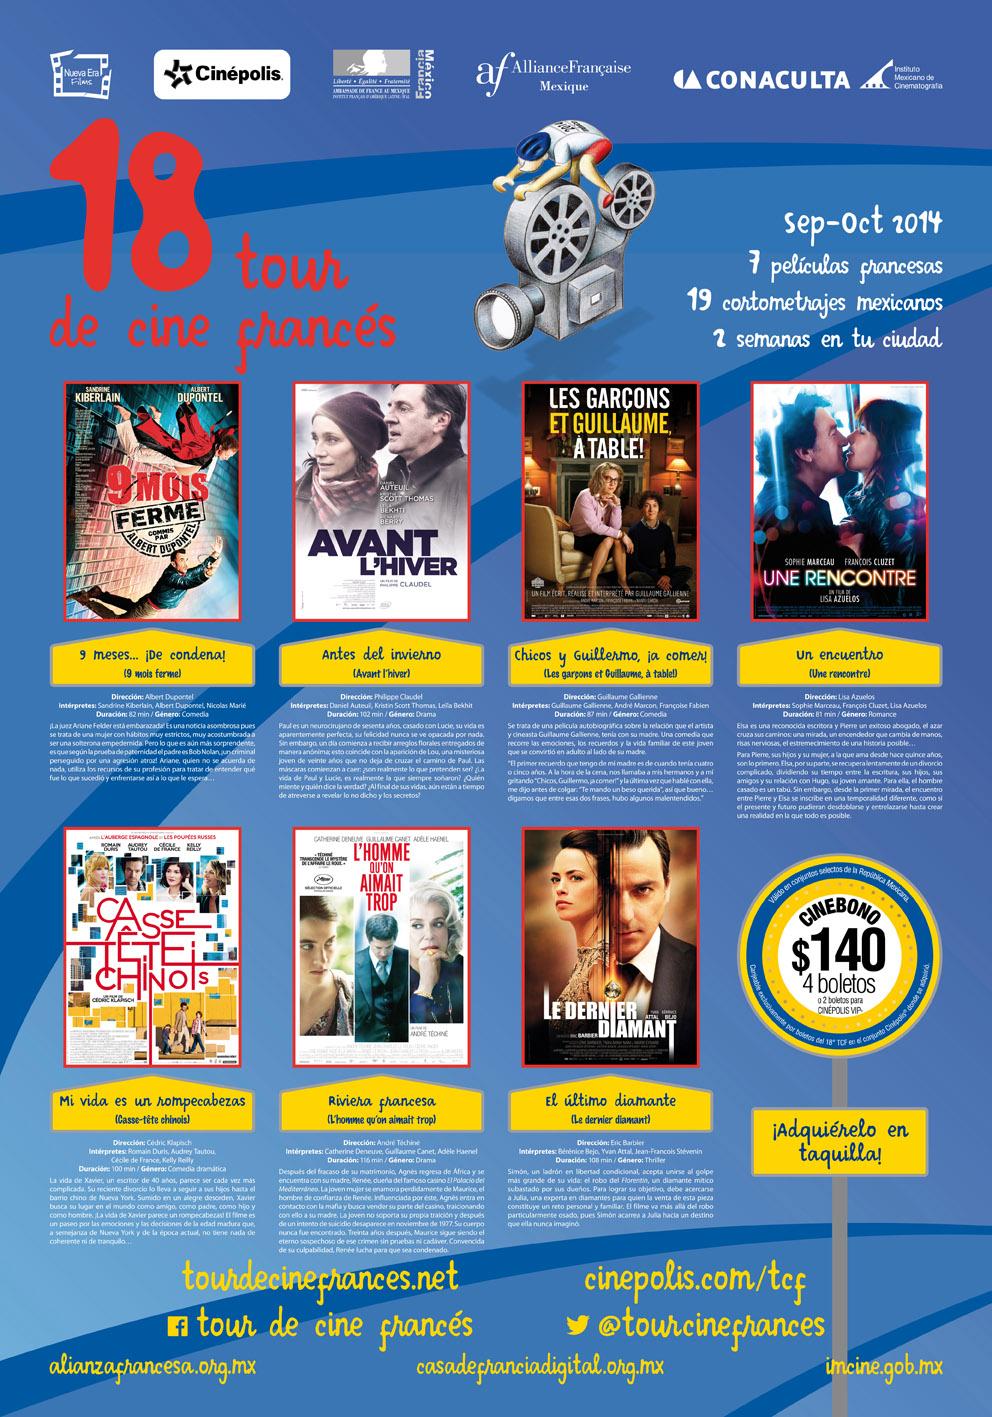 18 tour de cine franc s un fest n f lmico para todo el for Cartelera cinepolis cd jardin